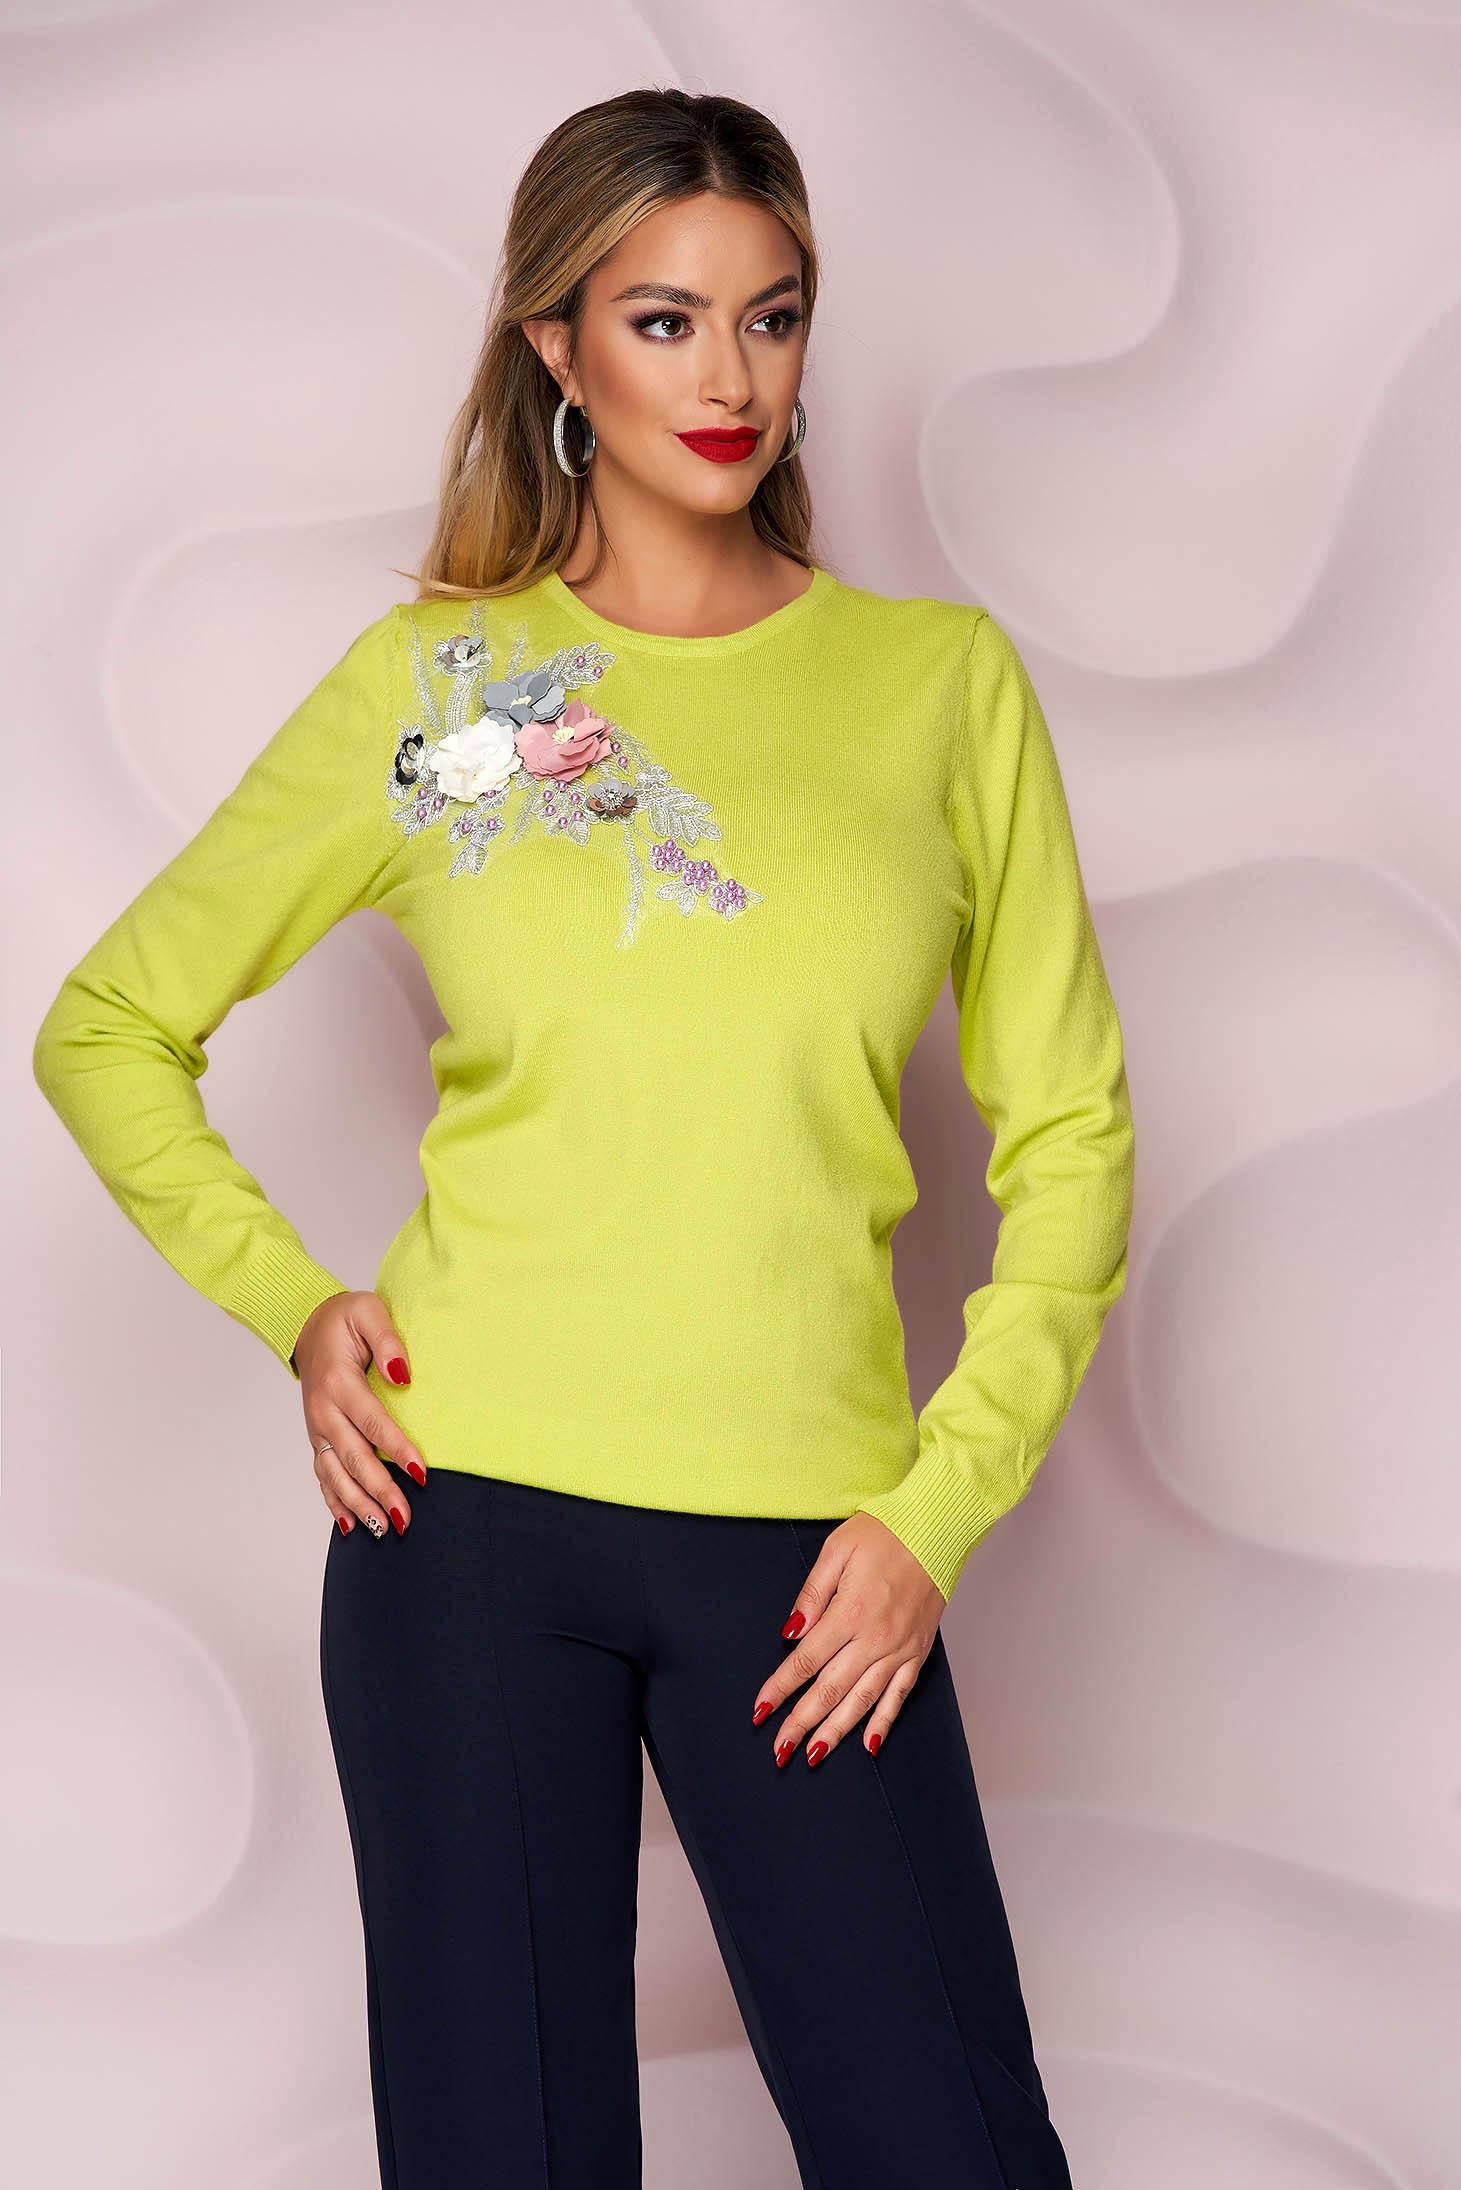 Pulover Lady Pandora verde-deschis tricotat cu croi larg cu flori in relief cu efect 3d